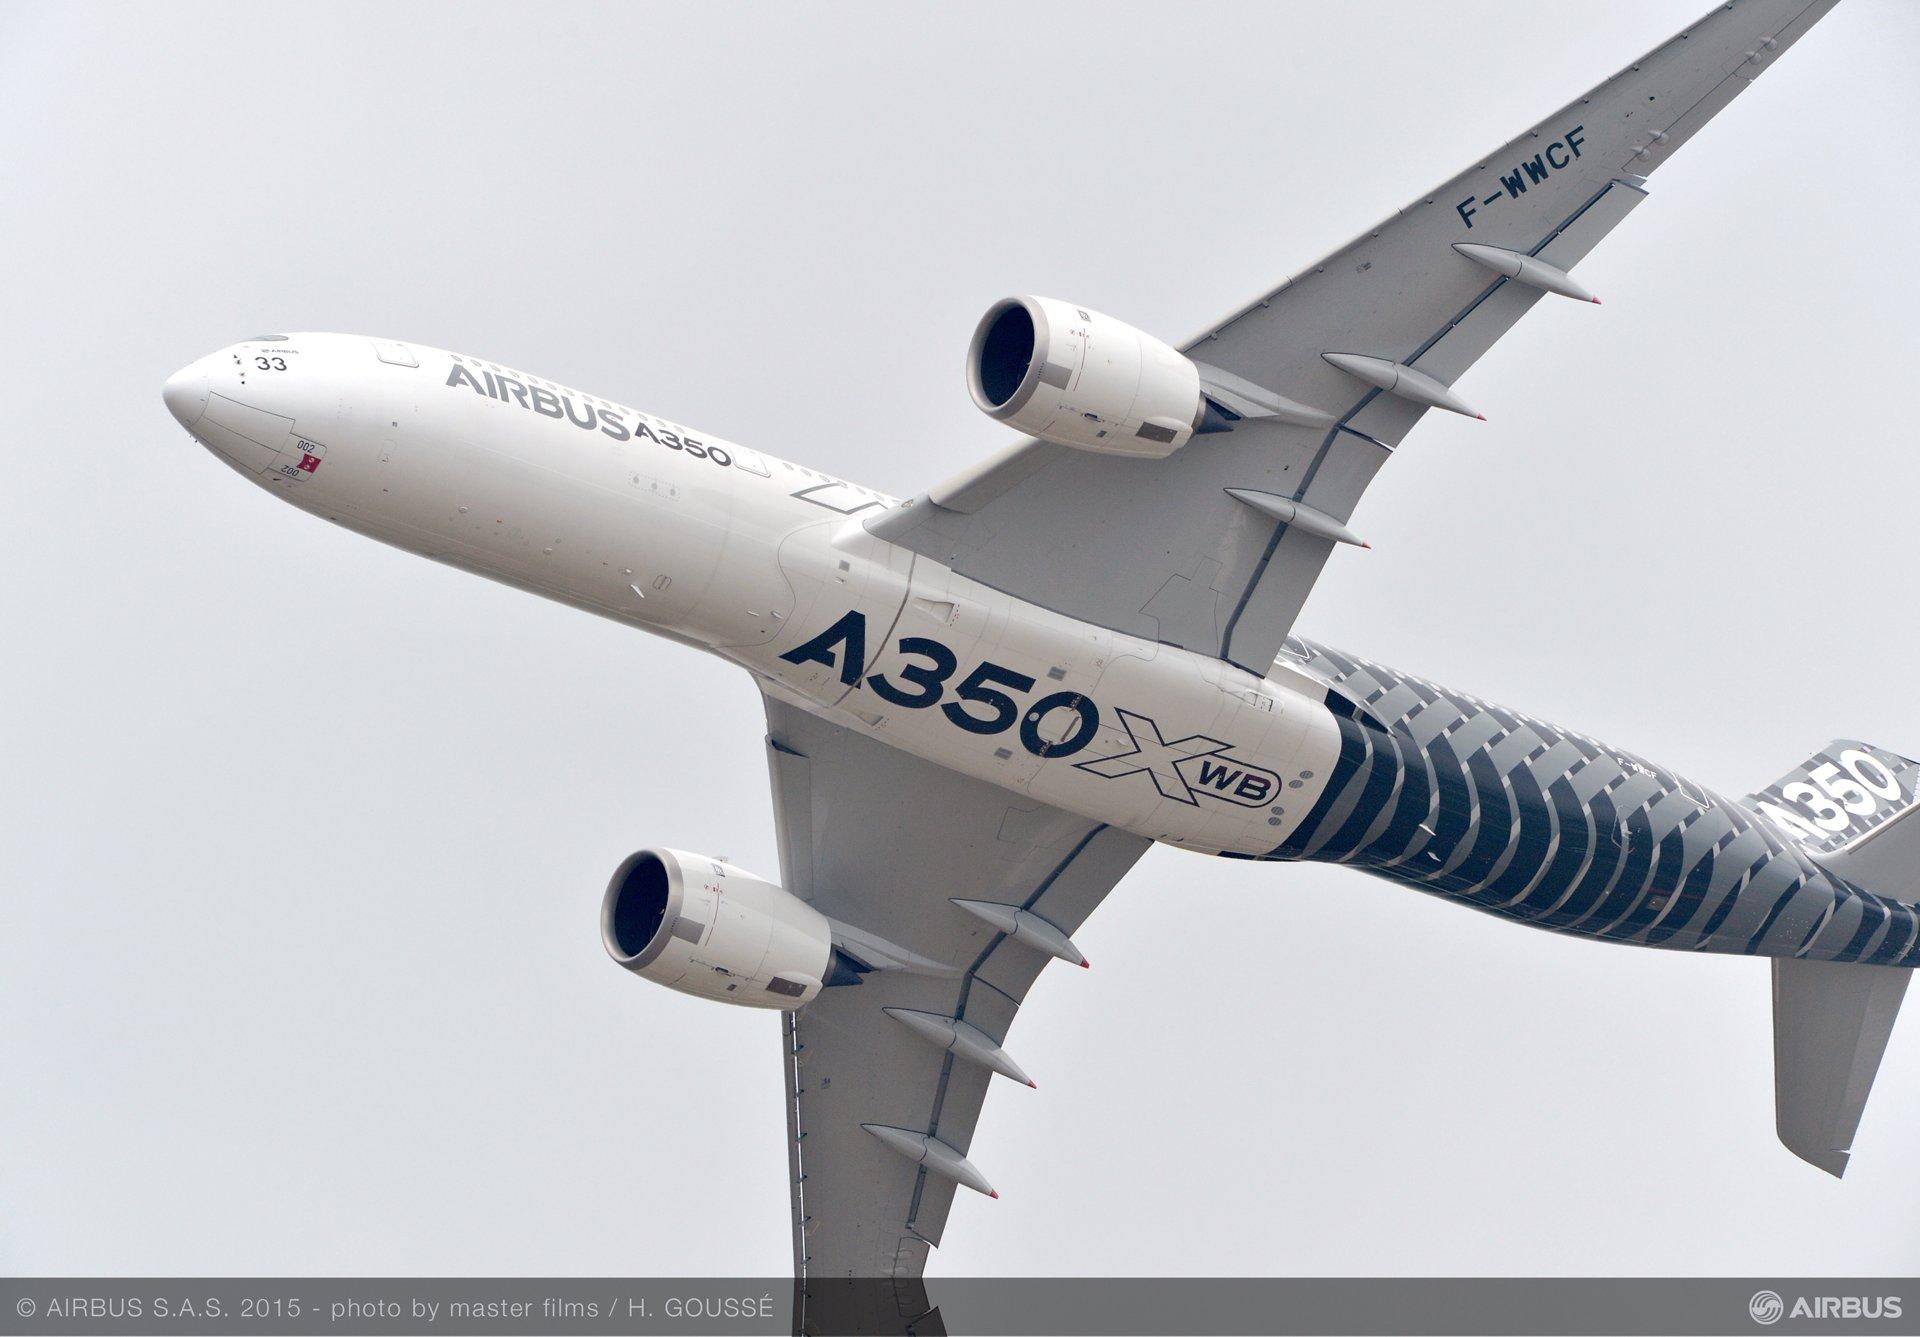 Paris Air Show 2015_A350 XWB flying display 3